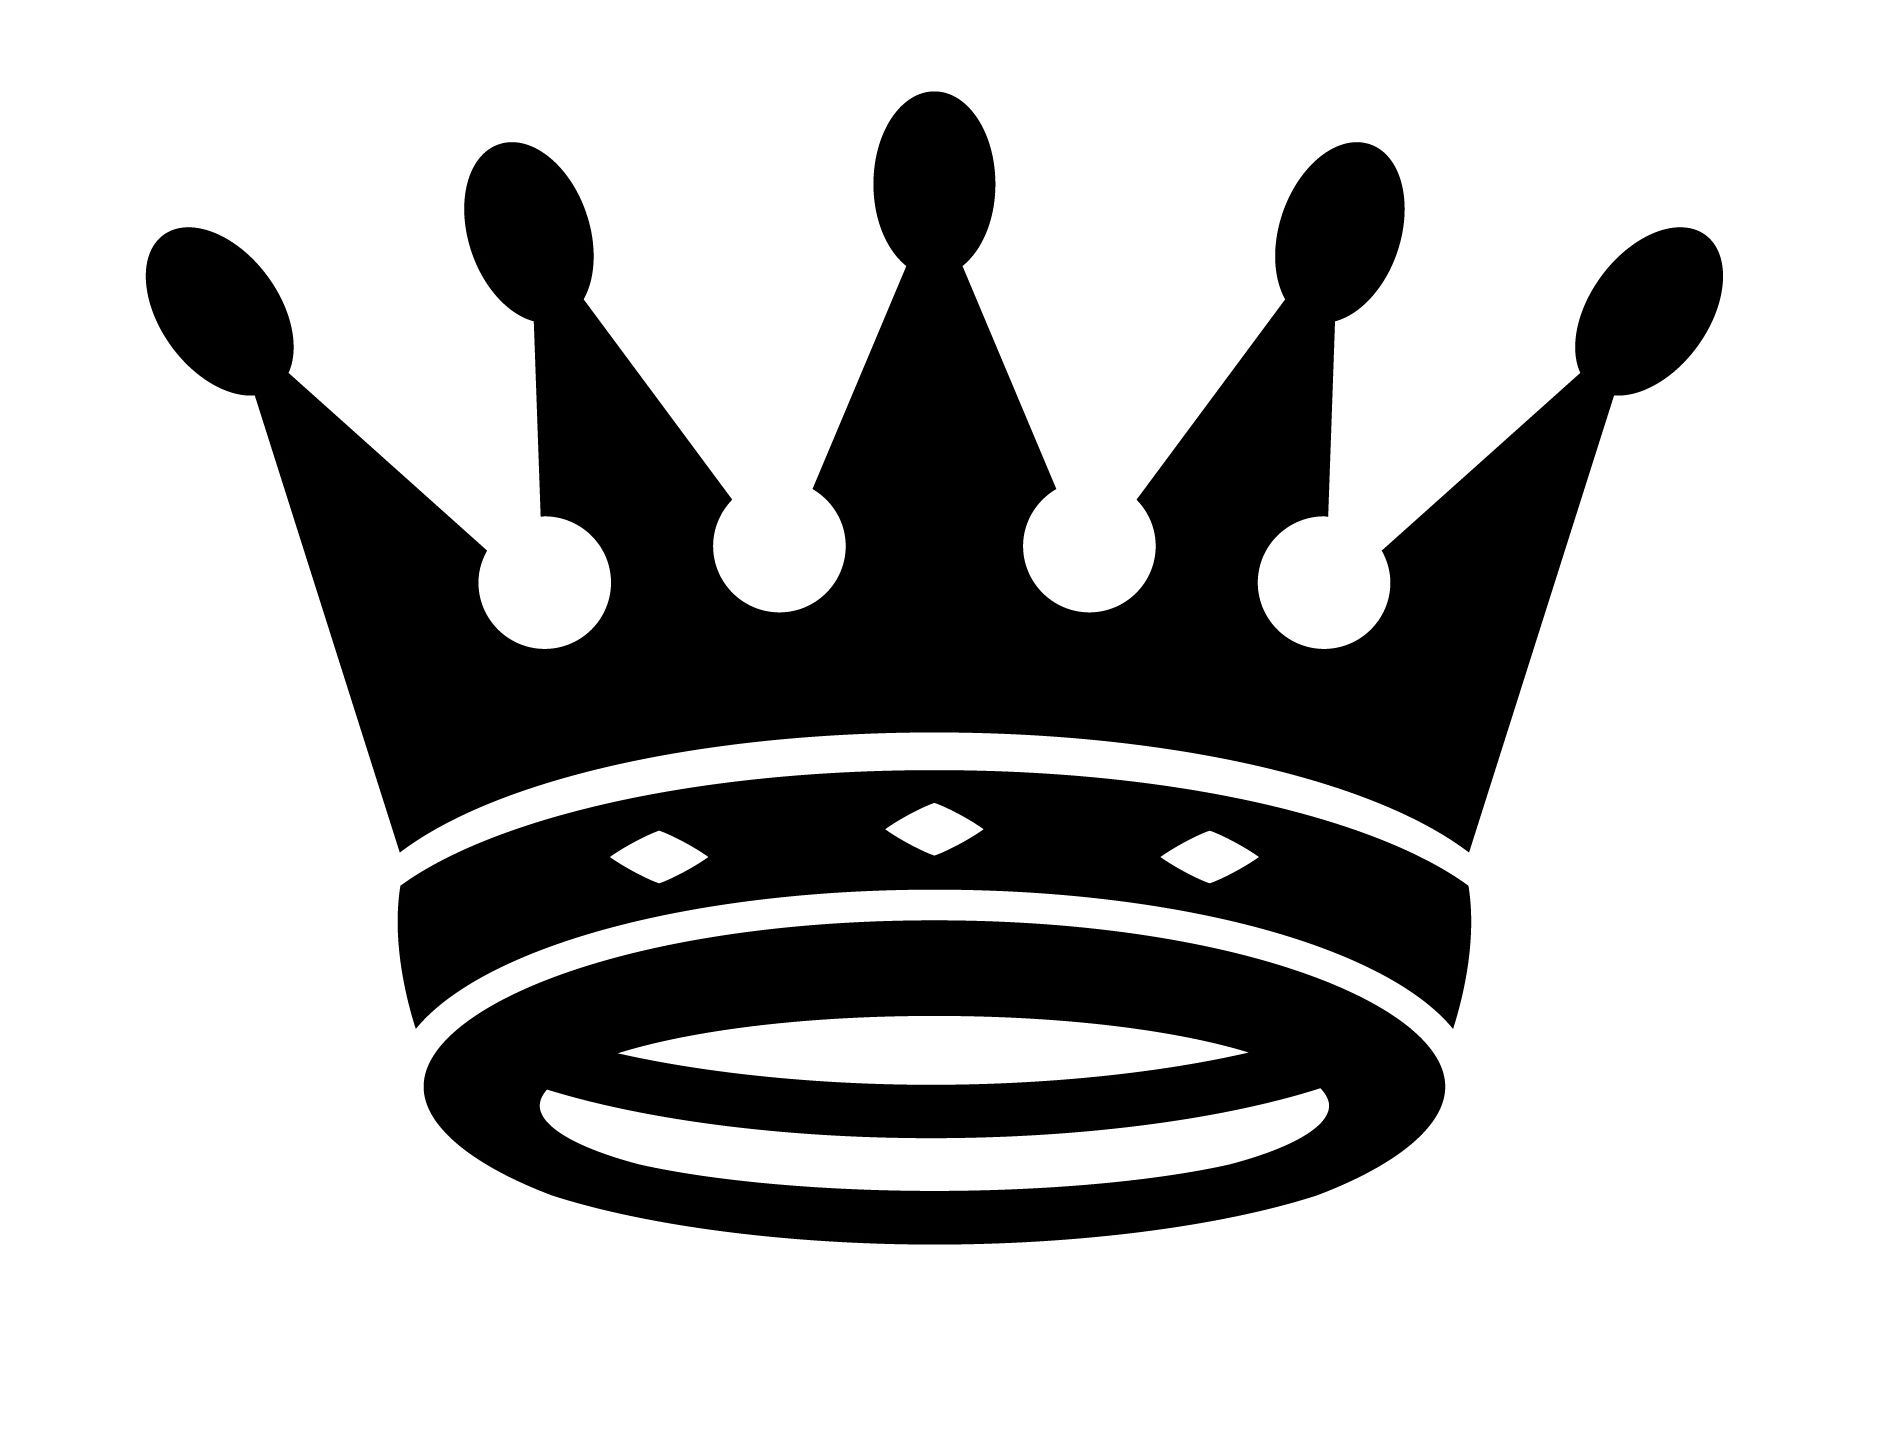 A queen crown clipart clip art library download Queen crown crown king and queen clip art cliparts and others | true ... clip art library download